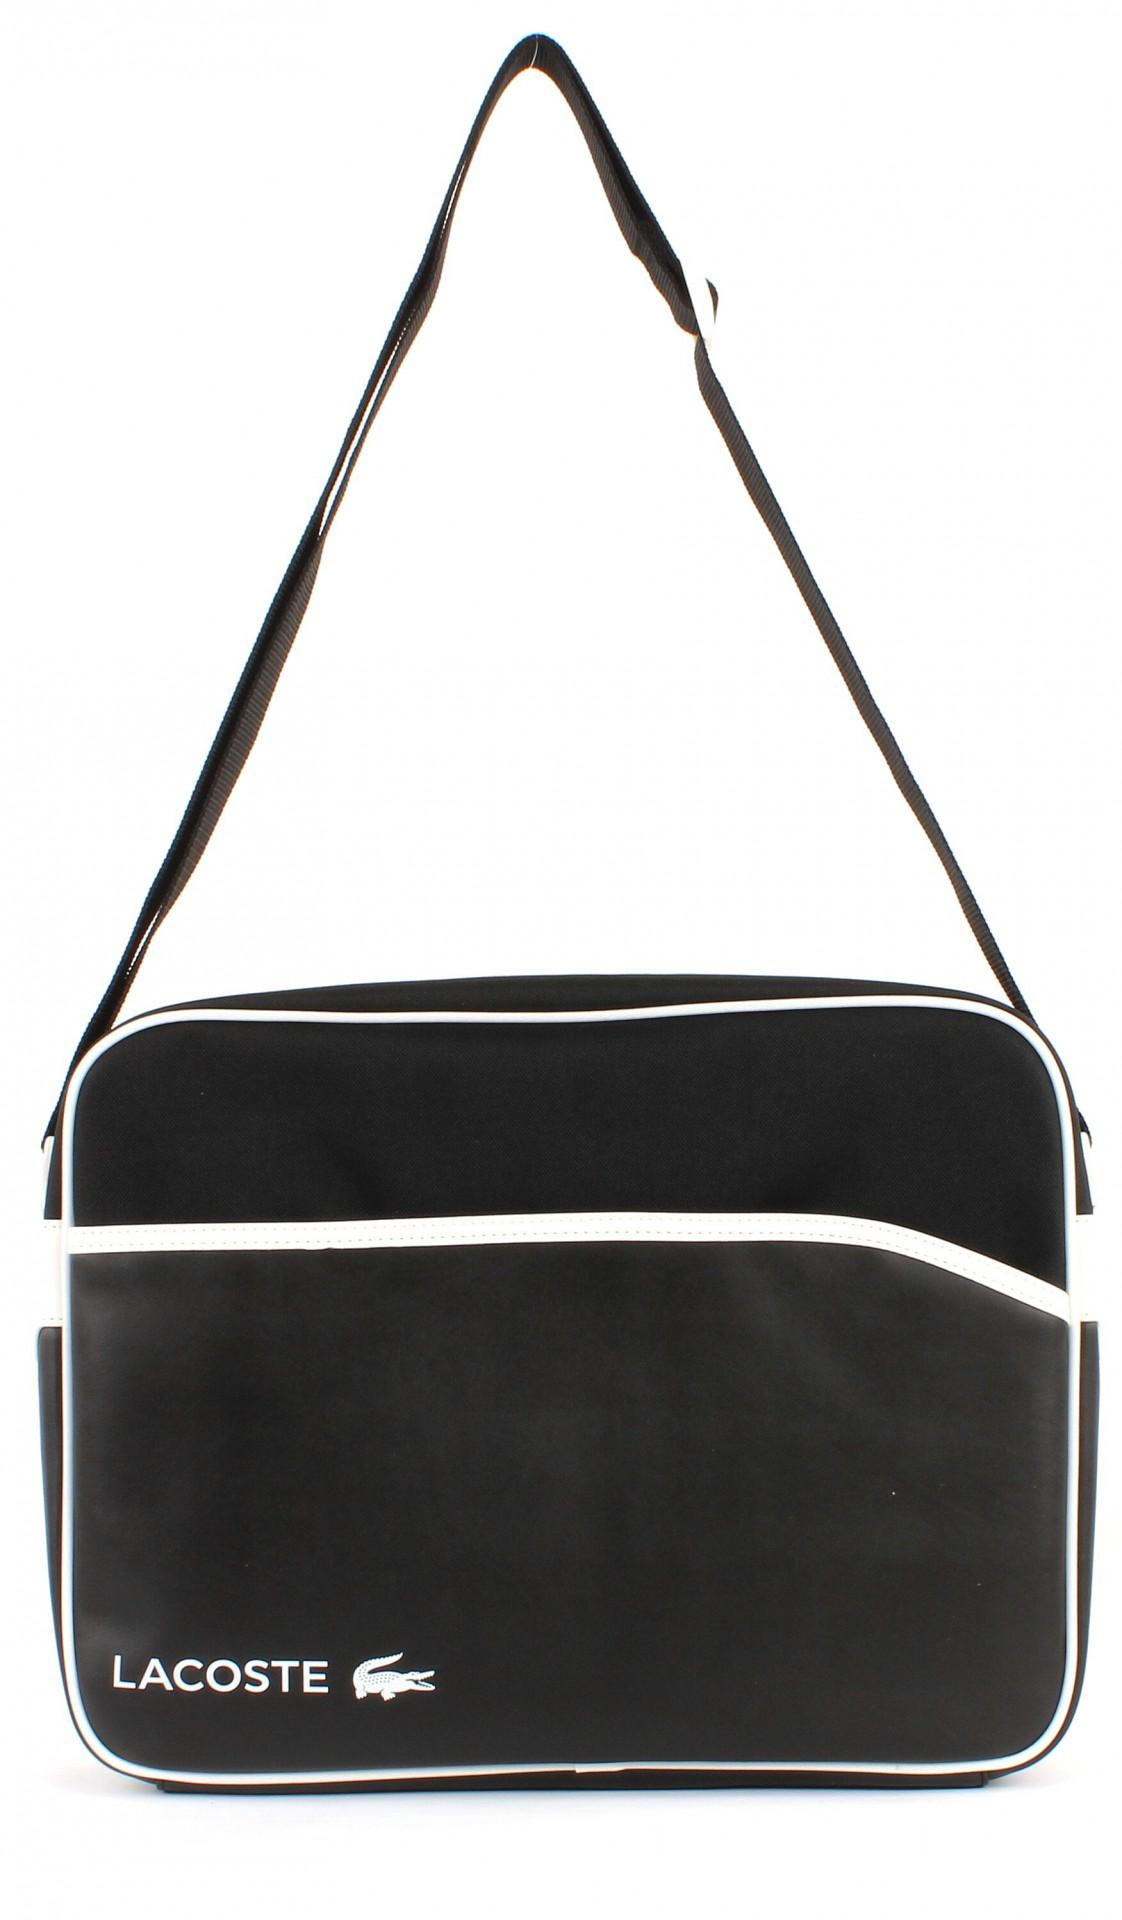 lacoste airline bag tasche schultertasche umh ngetasche. Black Bedroom Furniture Sets. Home Design Ideas